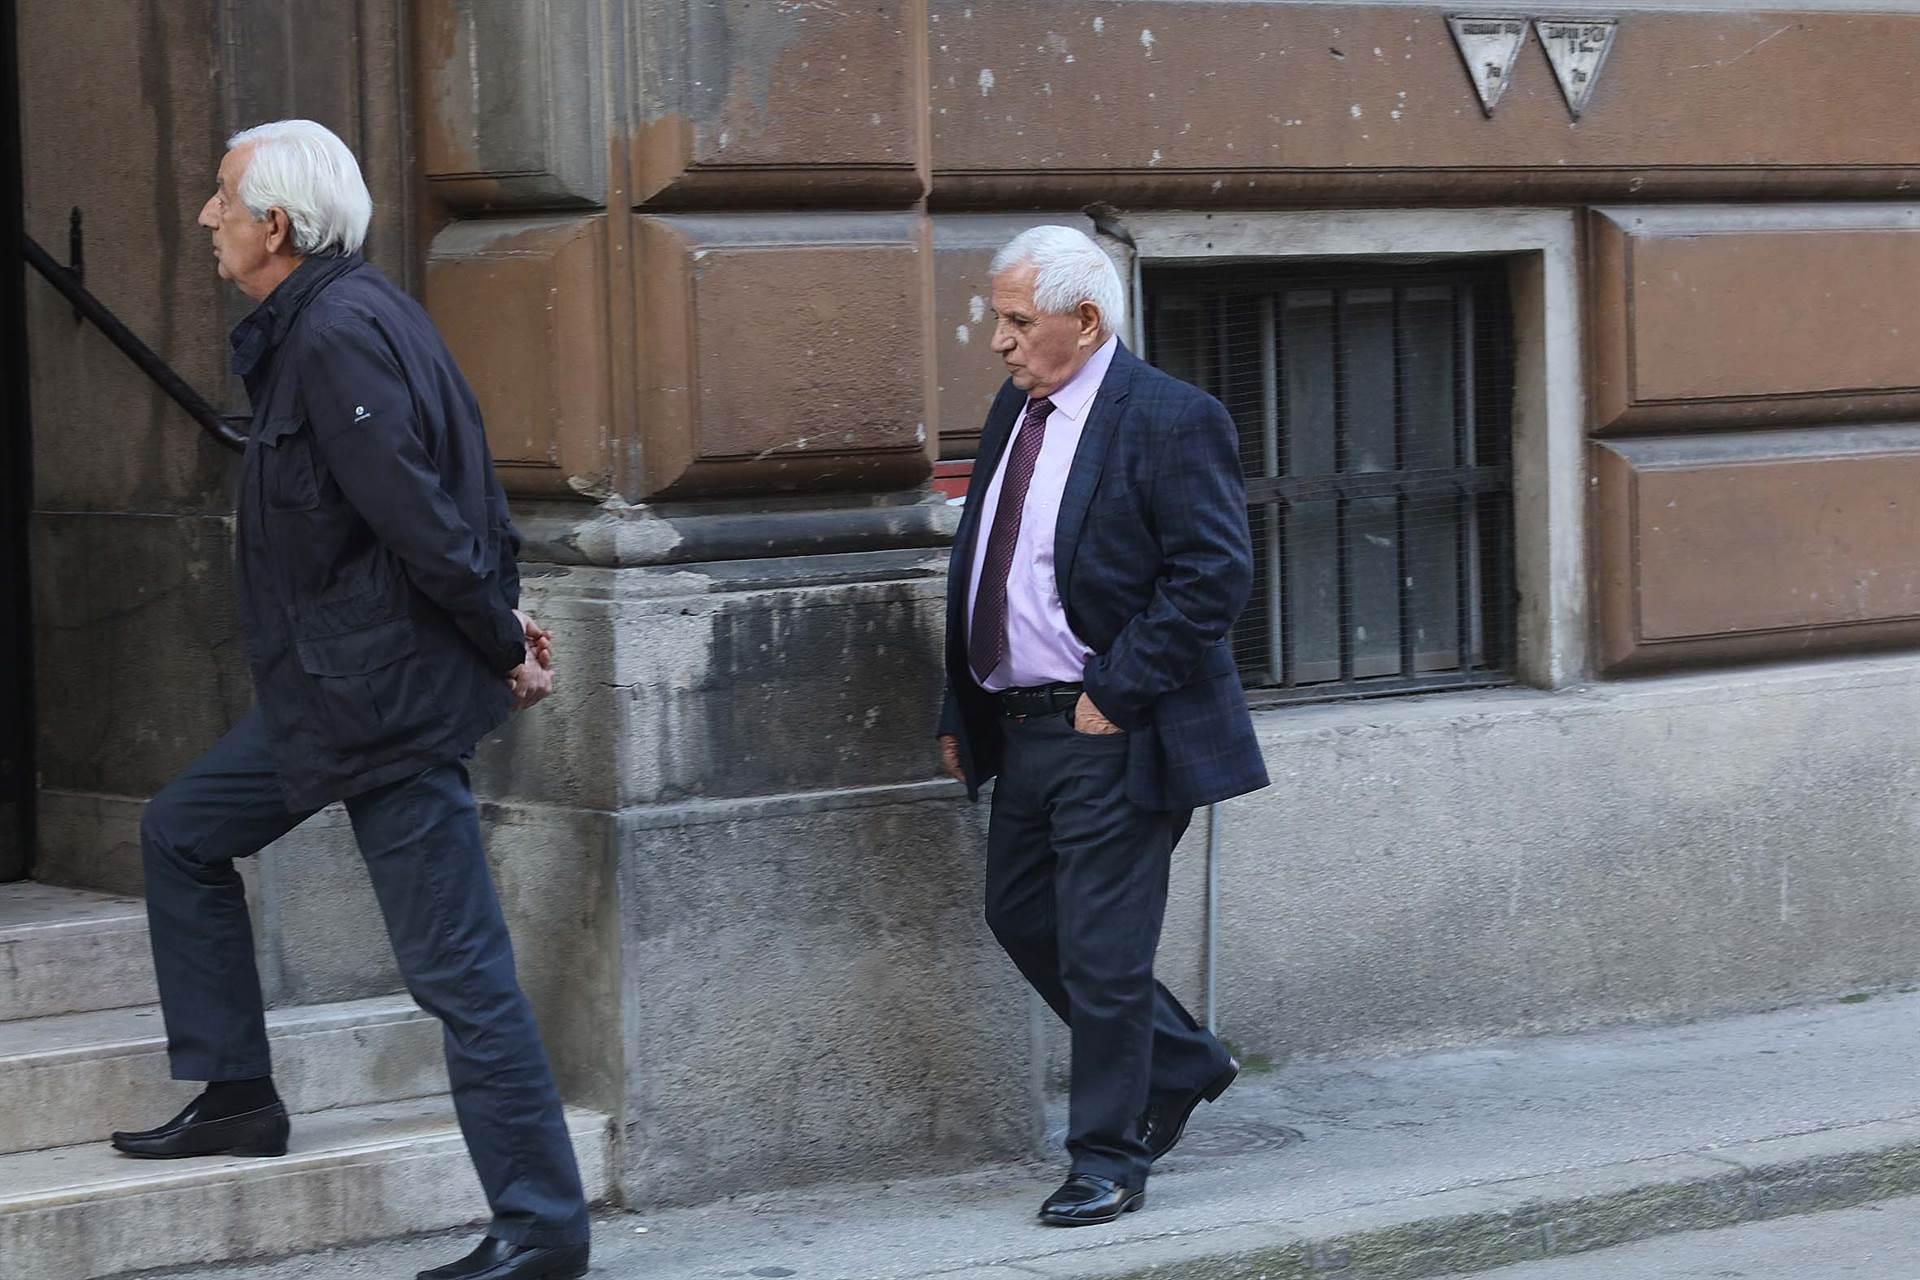 Tužilaštvo traži zatvorsku kaznu za bivše čelnike GRAS-a